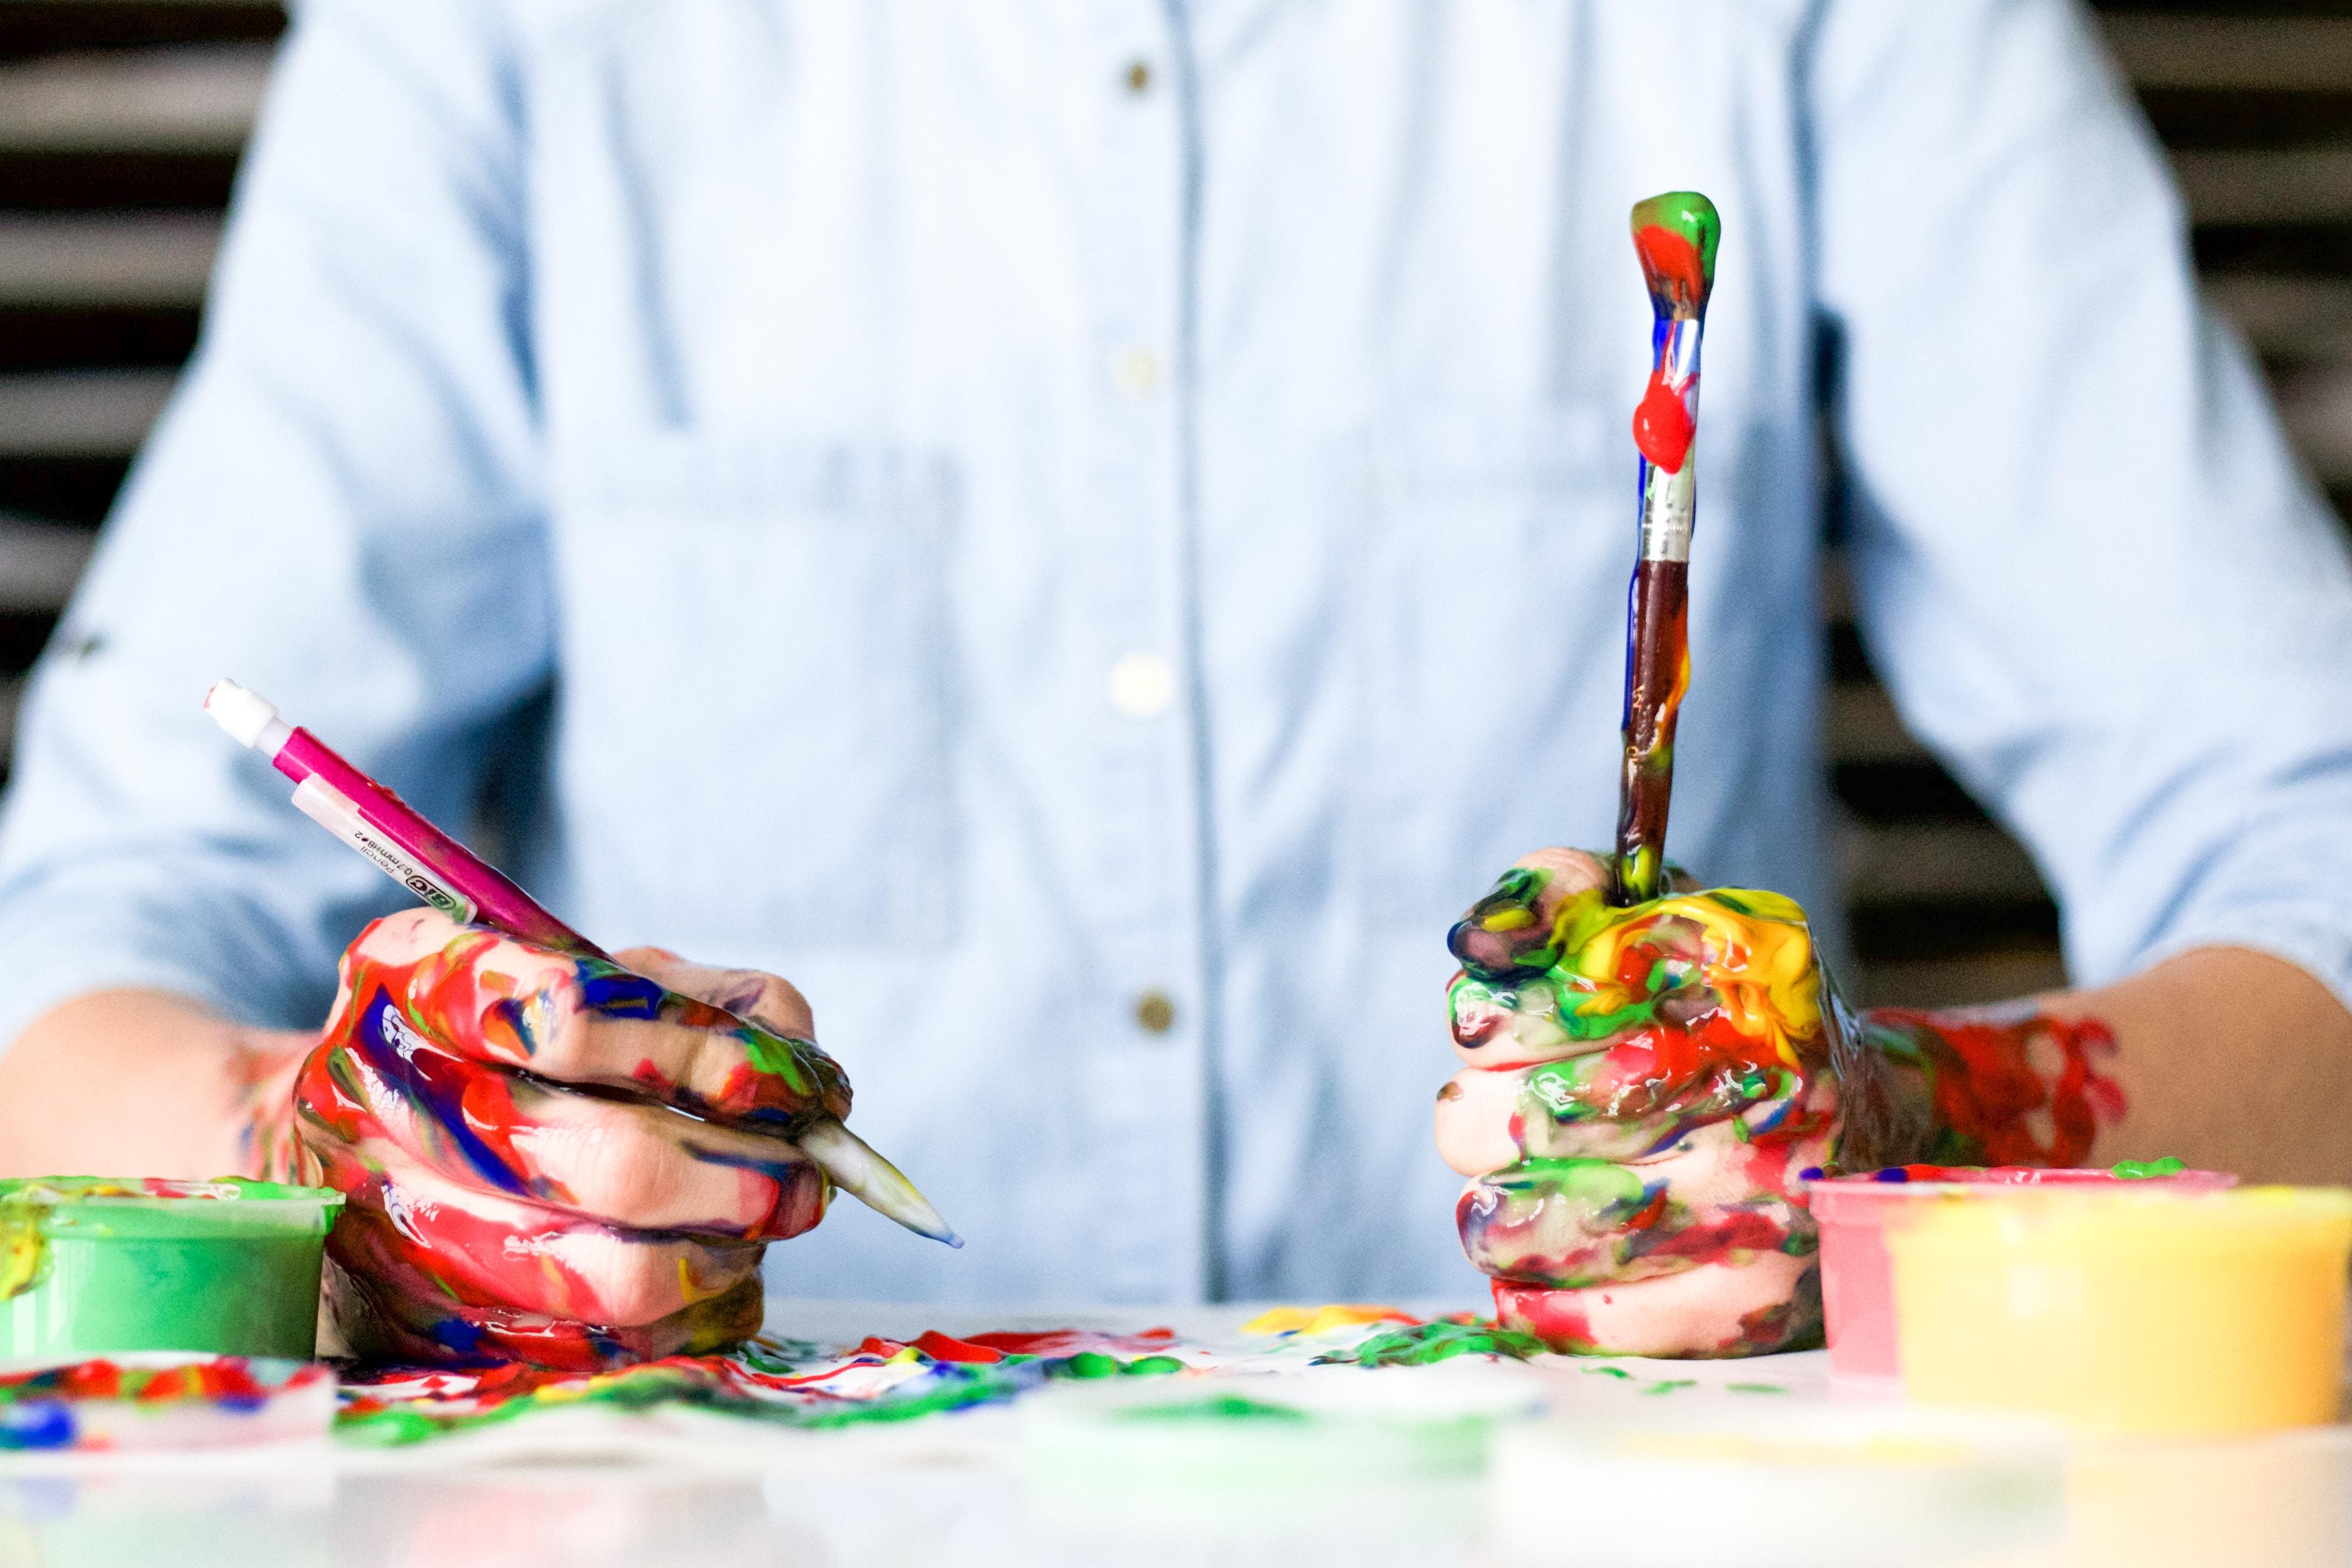 L'art est-il un médicament ?